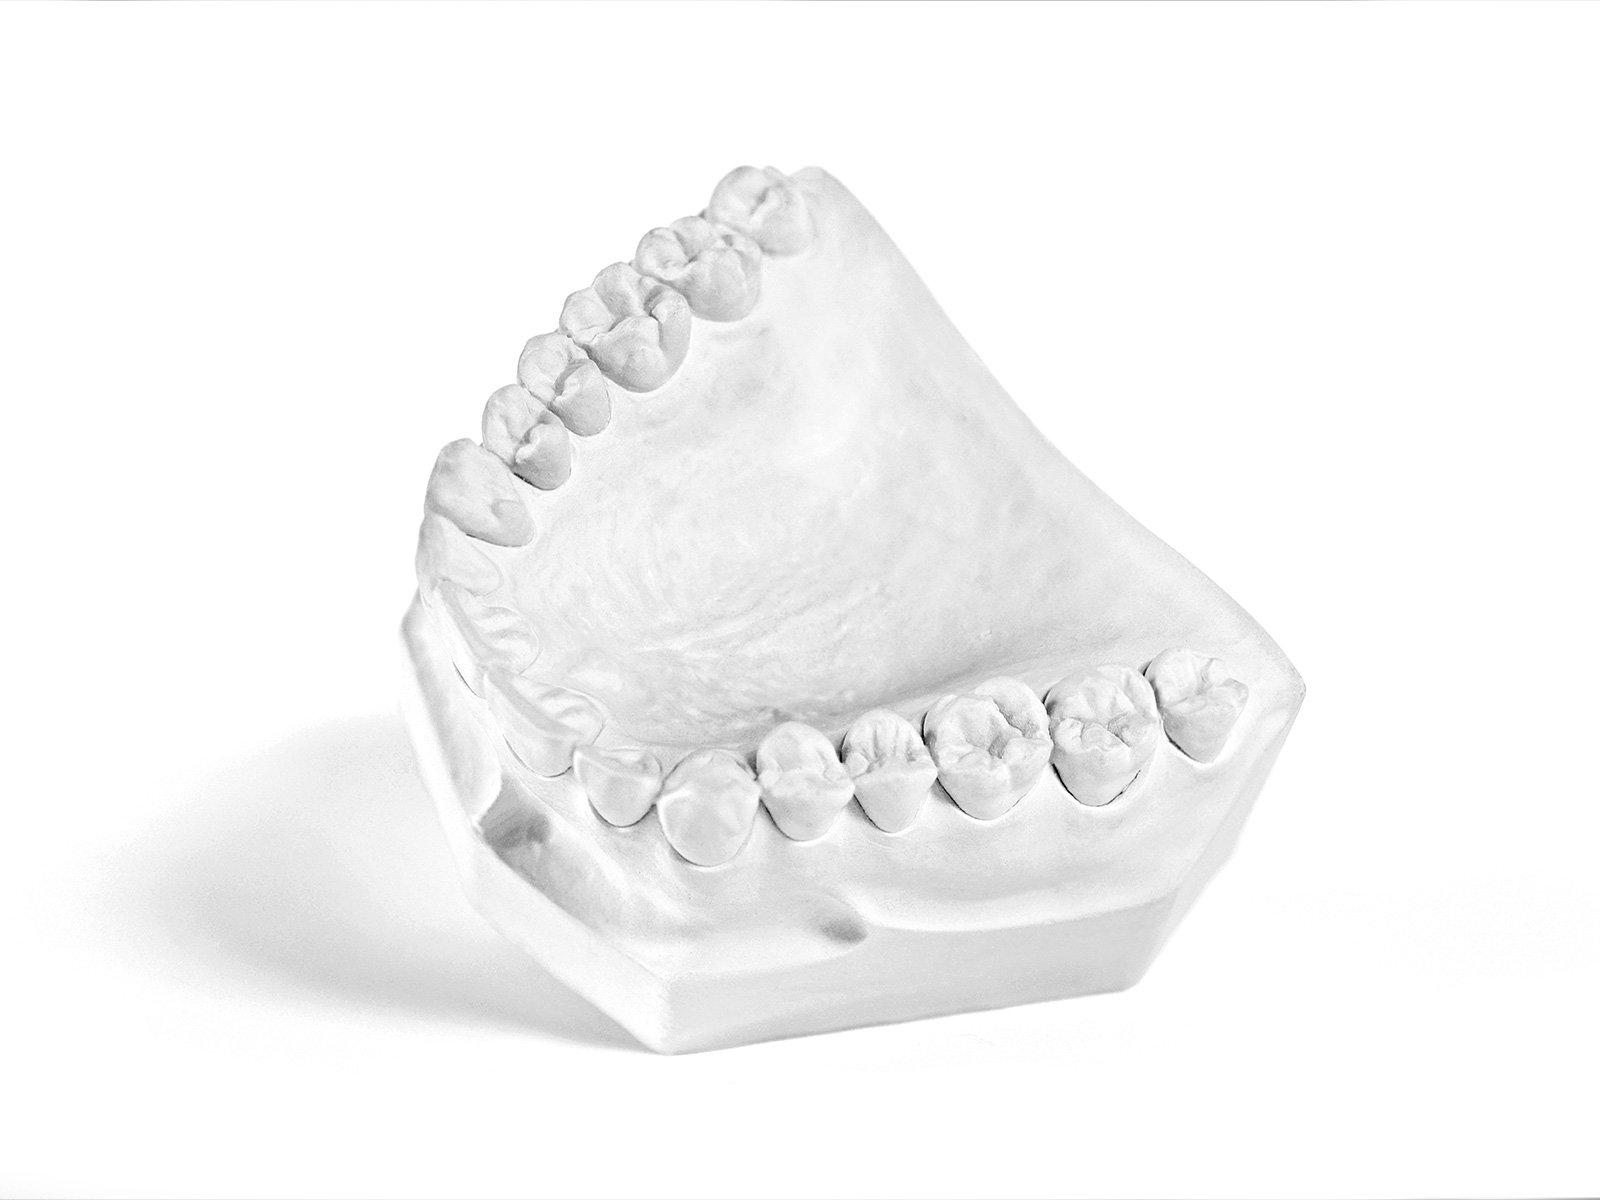 Garreco 1500025 Dental Plaster Fast Set, Type II General Purpose Gypsum, 25 lb Carton, White